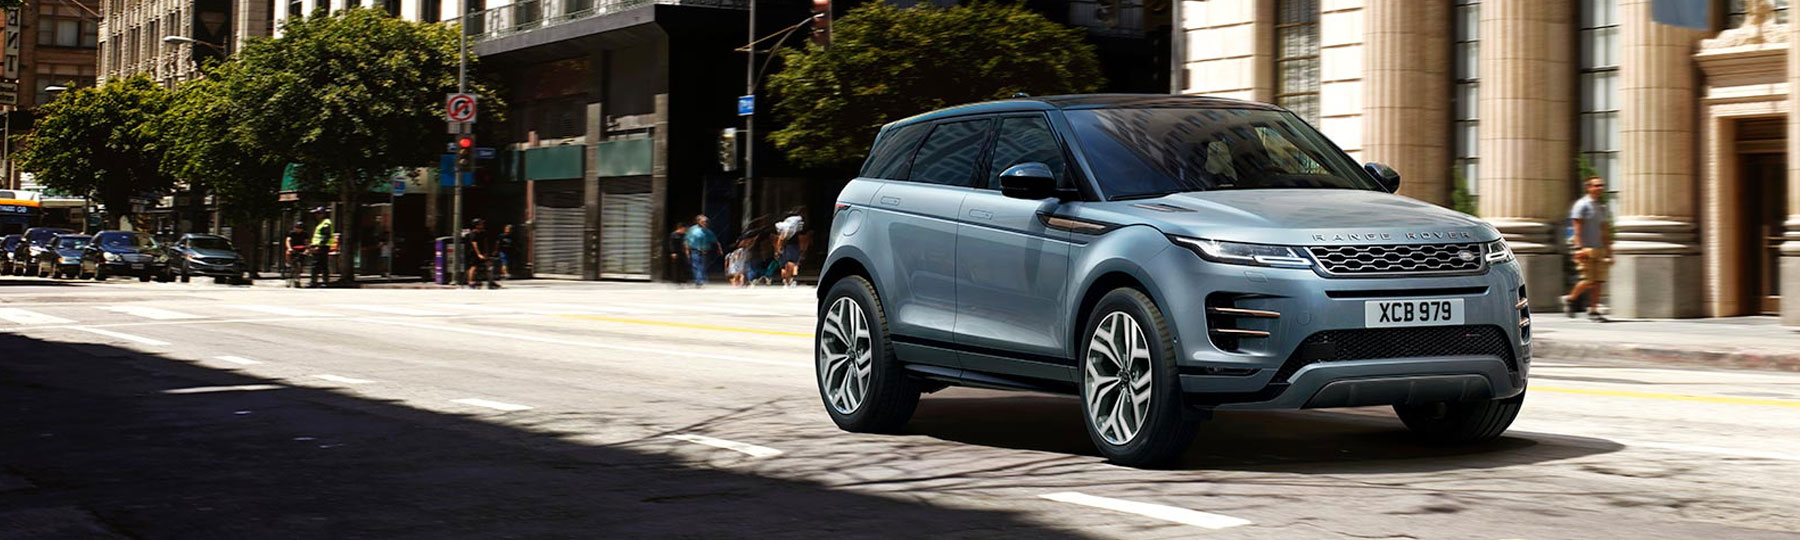 Land Rover Fleet & Business Evoque Contract Hire